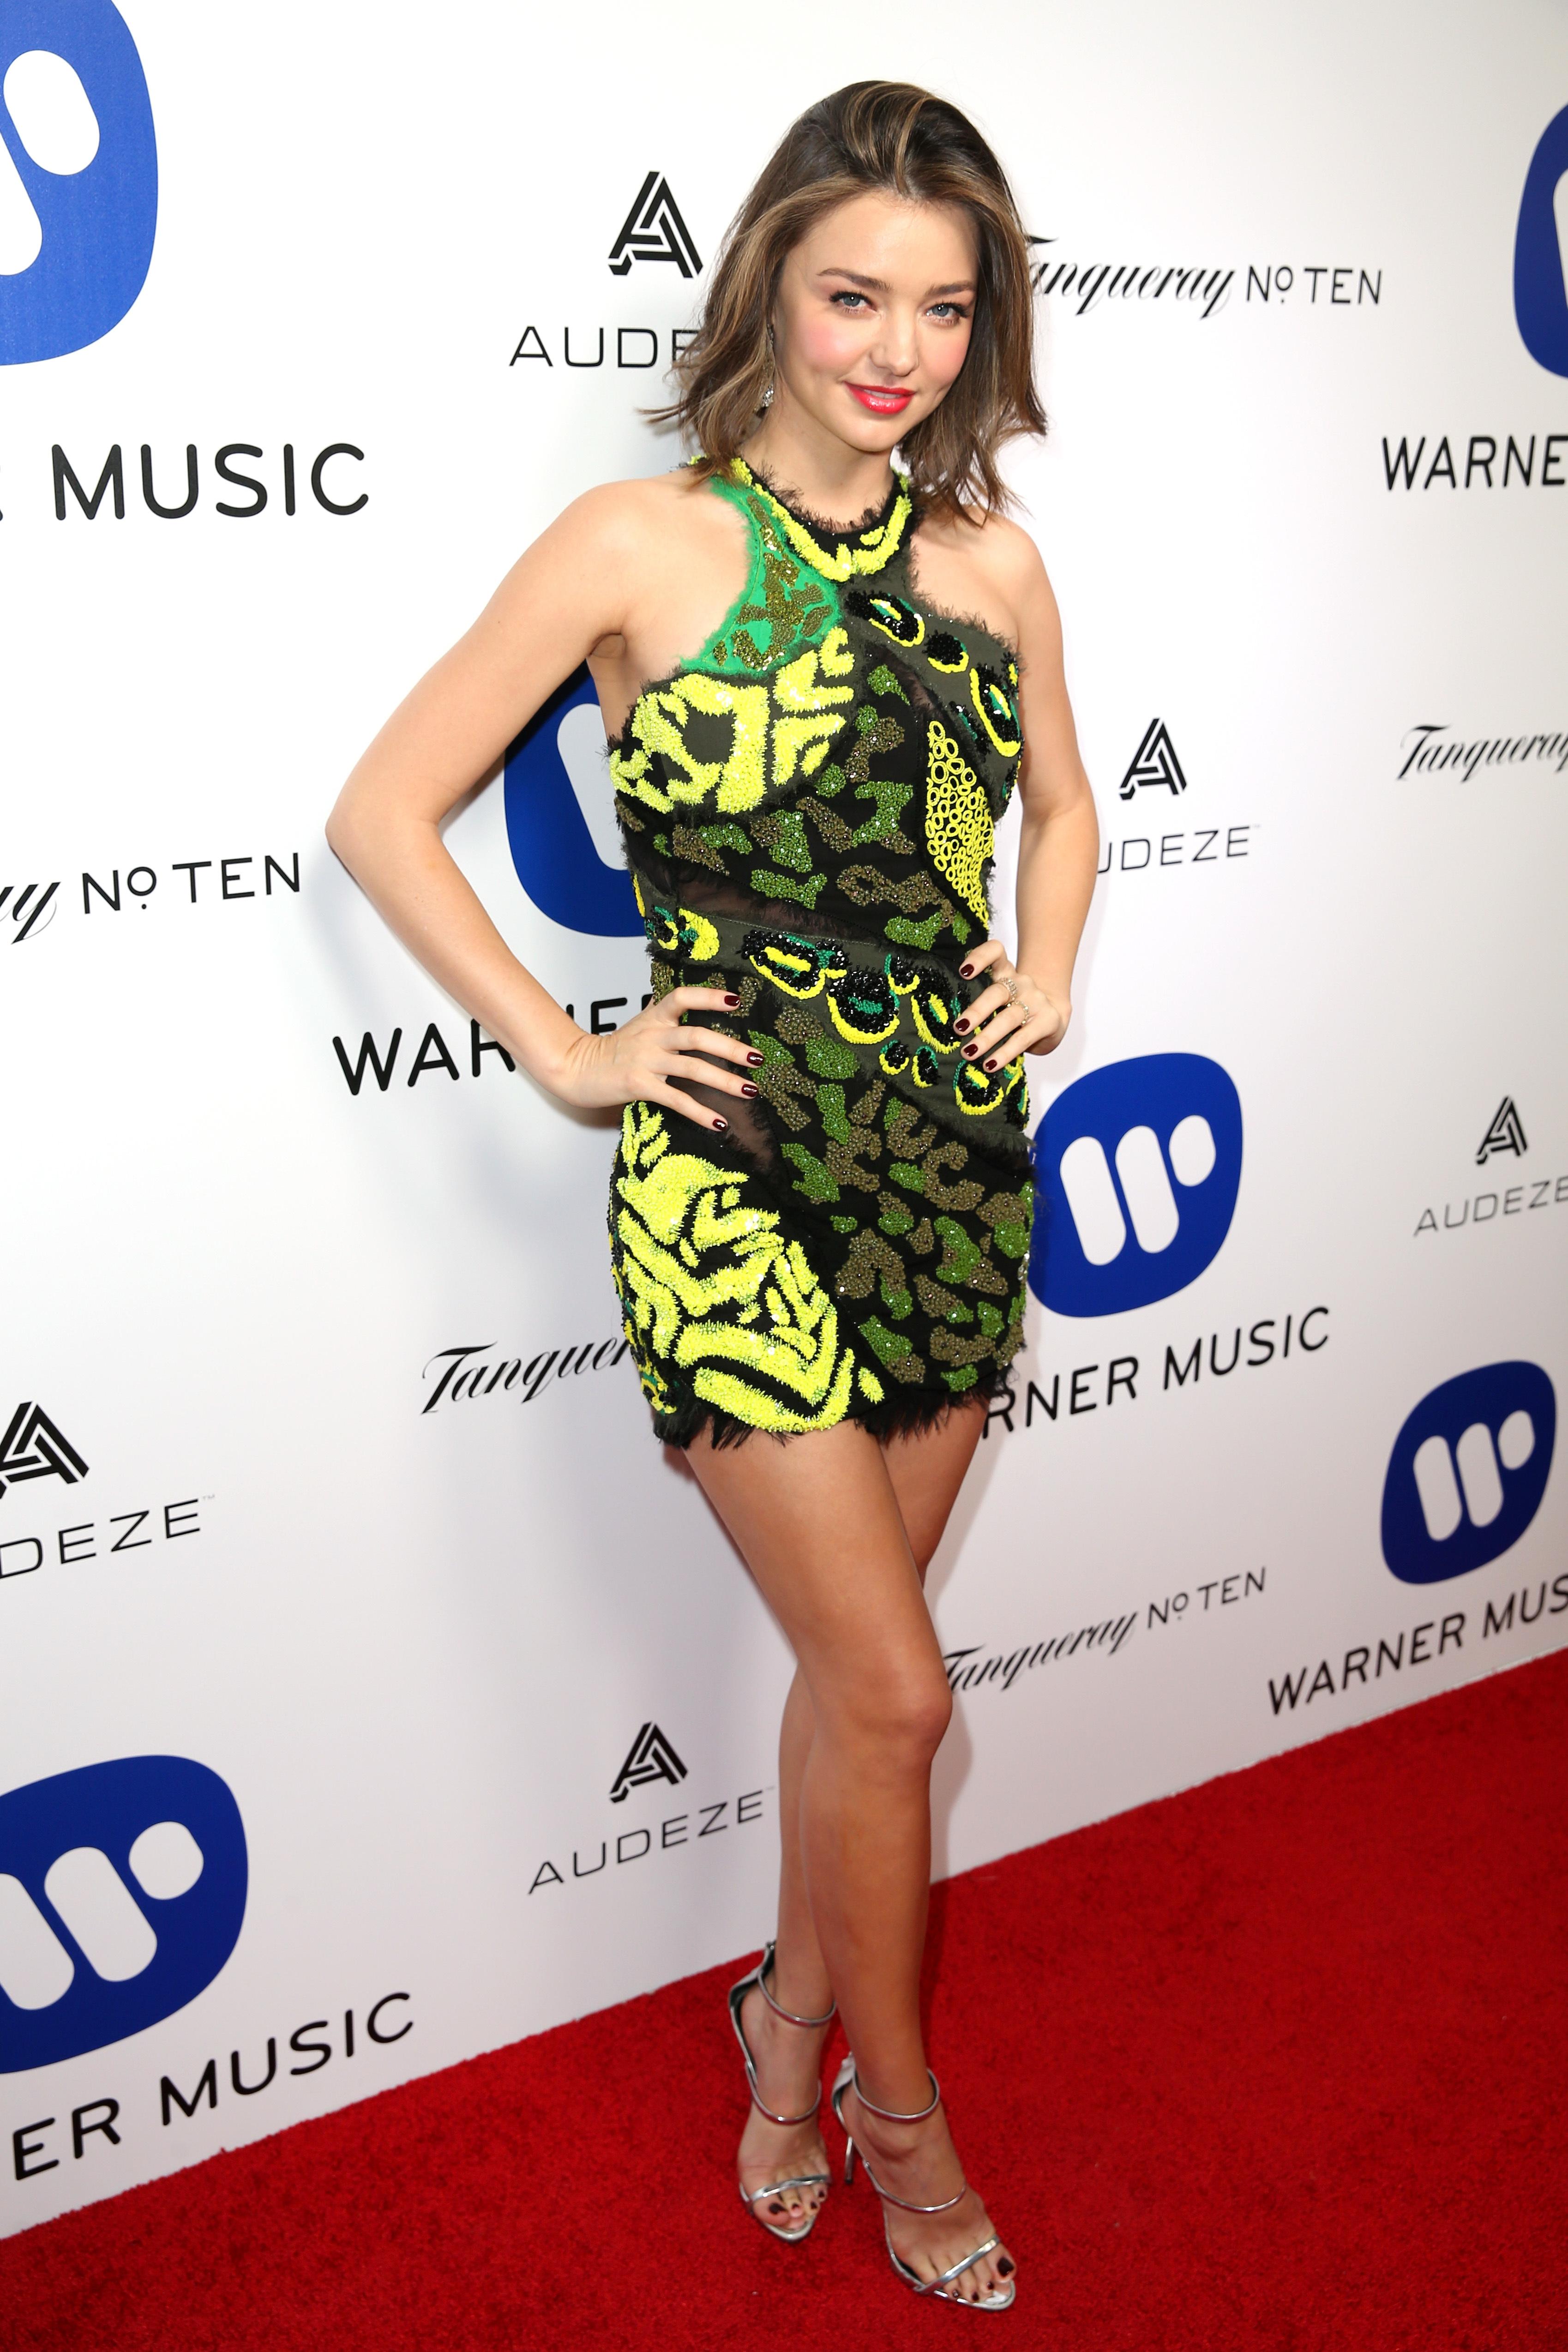 Orlando Bloom warned Miranda Kerr about those nude pics